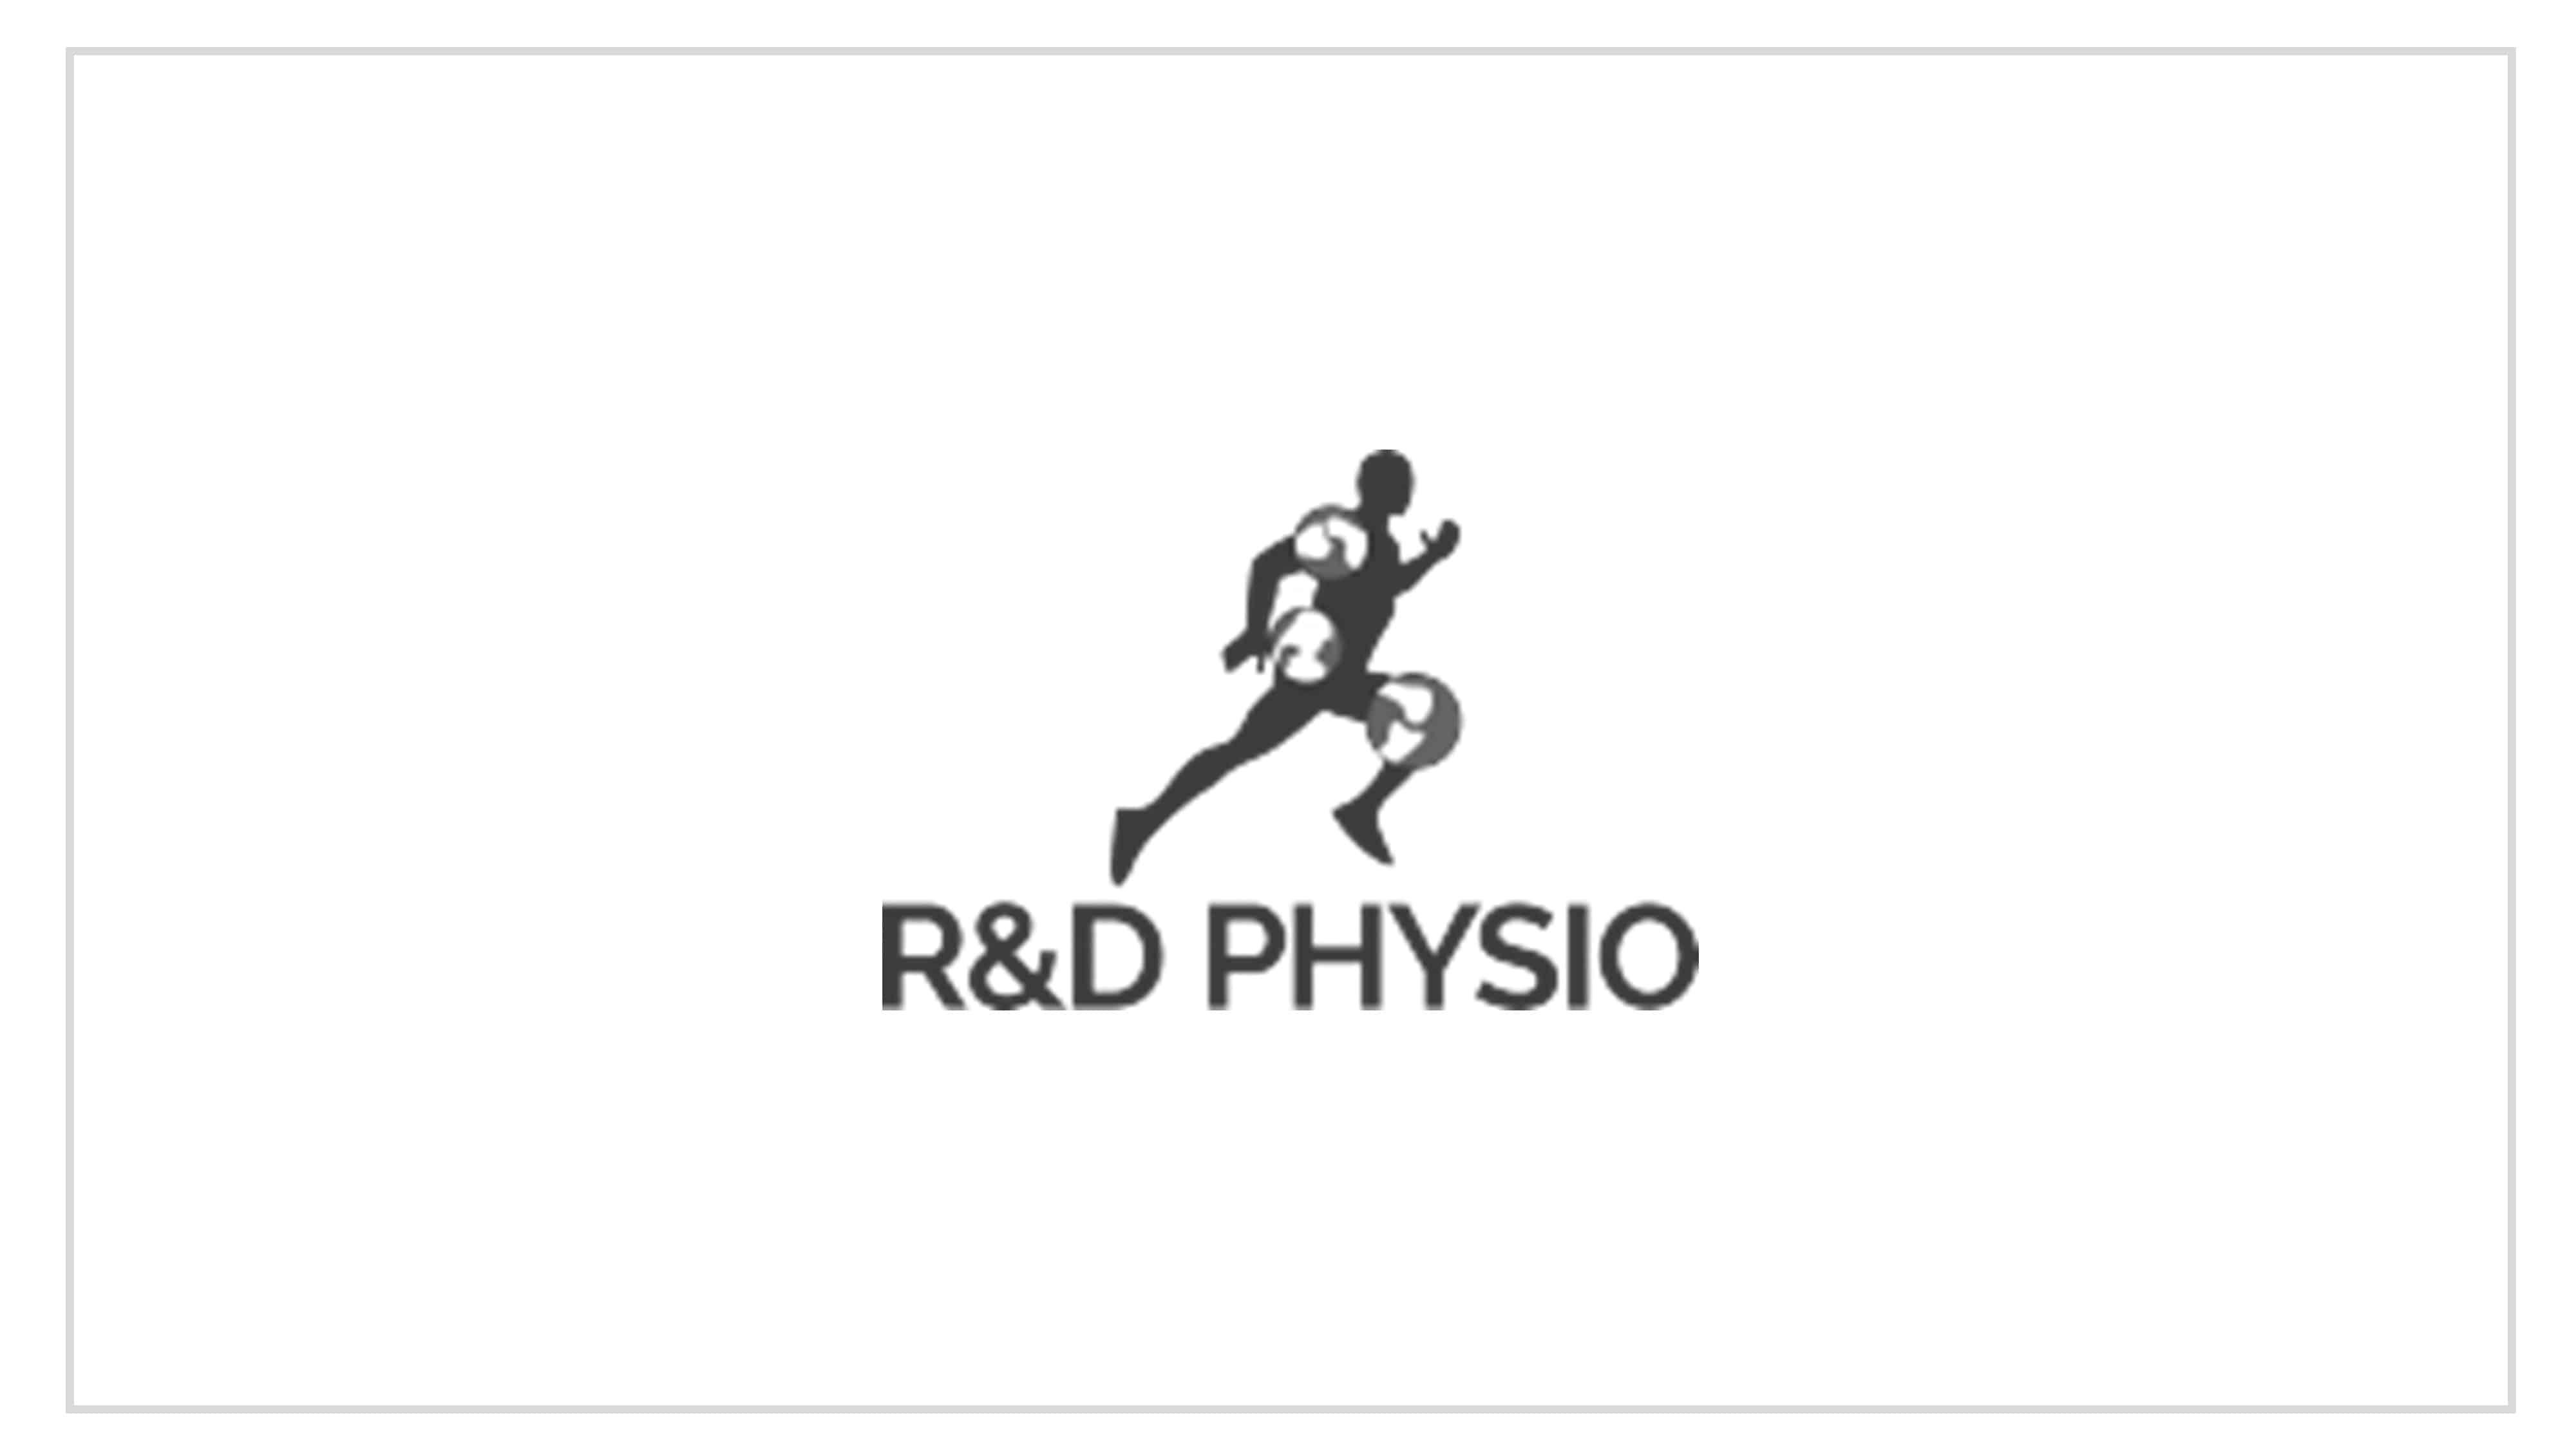 R&D Physio